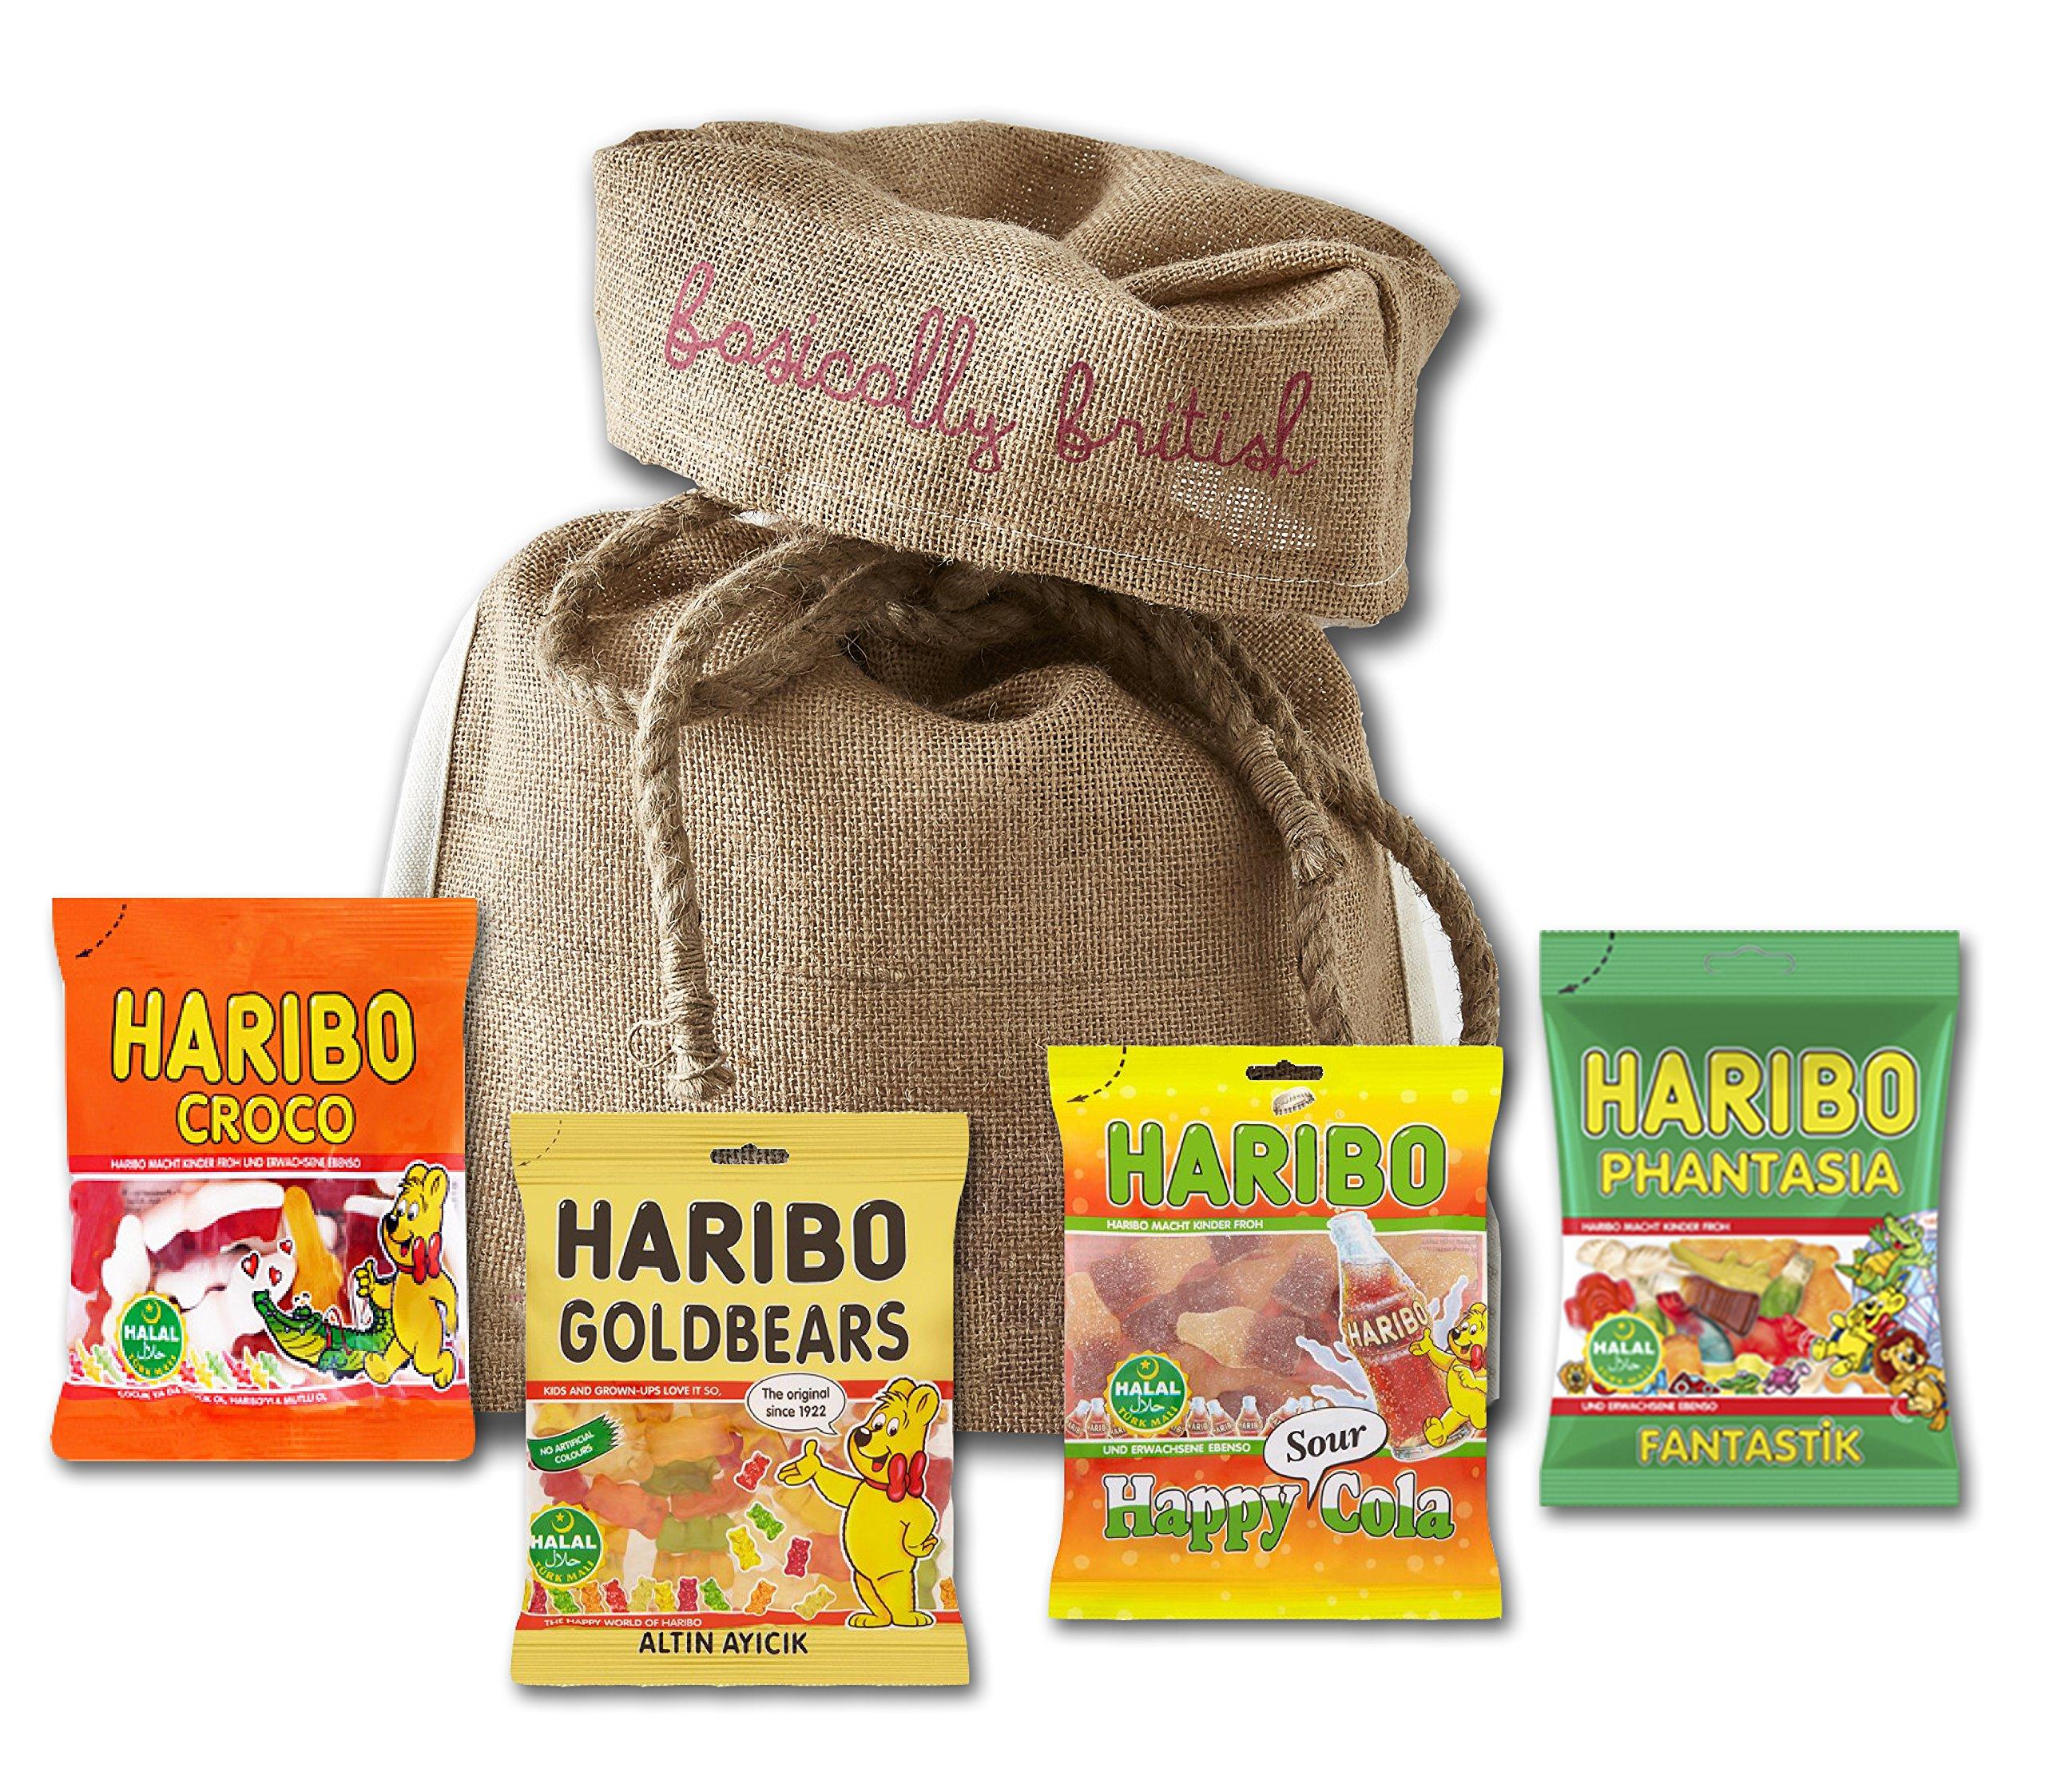 Haribo Halal Gummy Bears By The Yummy Palette Eid Mubarak Gifts Halal Haribo Cola Halal Haribo Gold Bears In Basically British Jute Gift Bag Buy Online In Bermuda At Bermuda Desertcart Com Productid